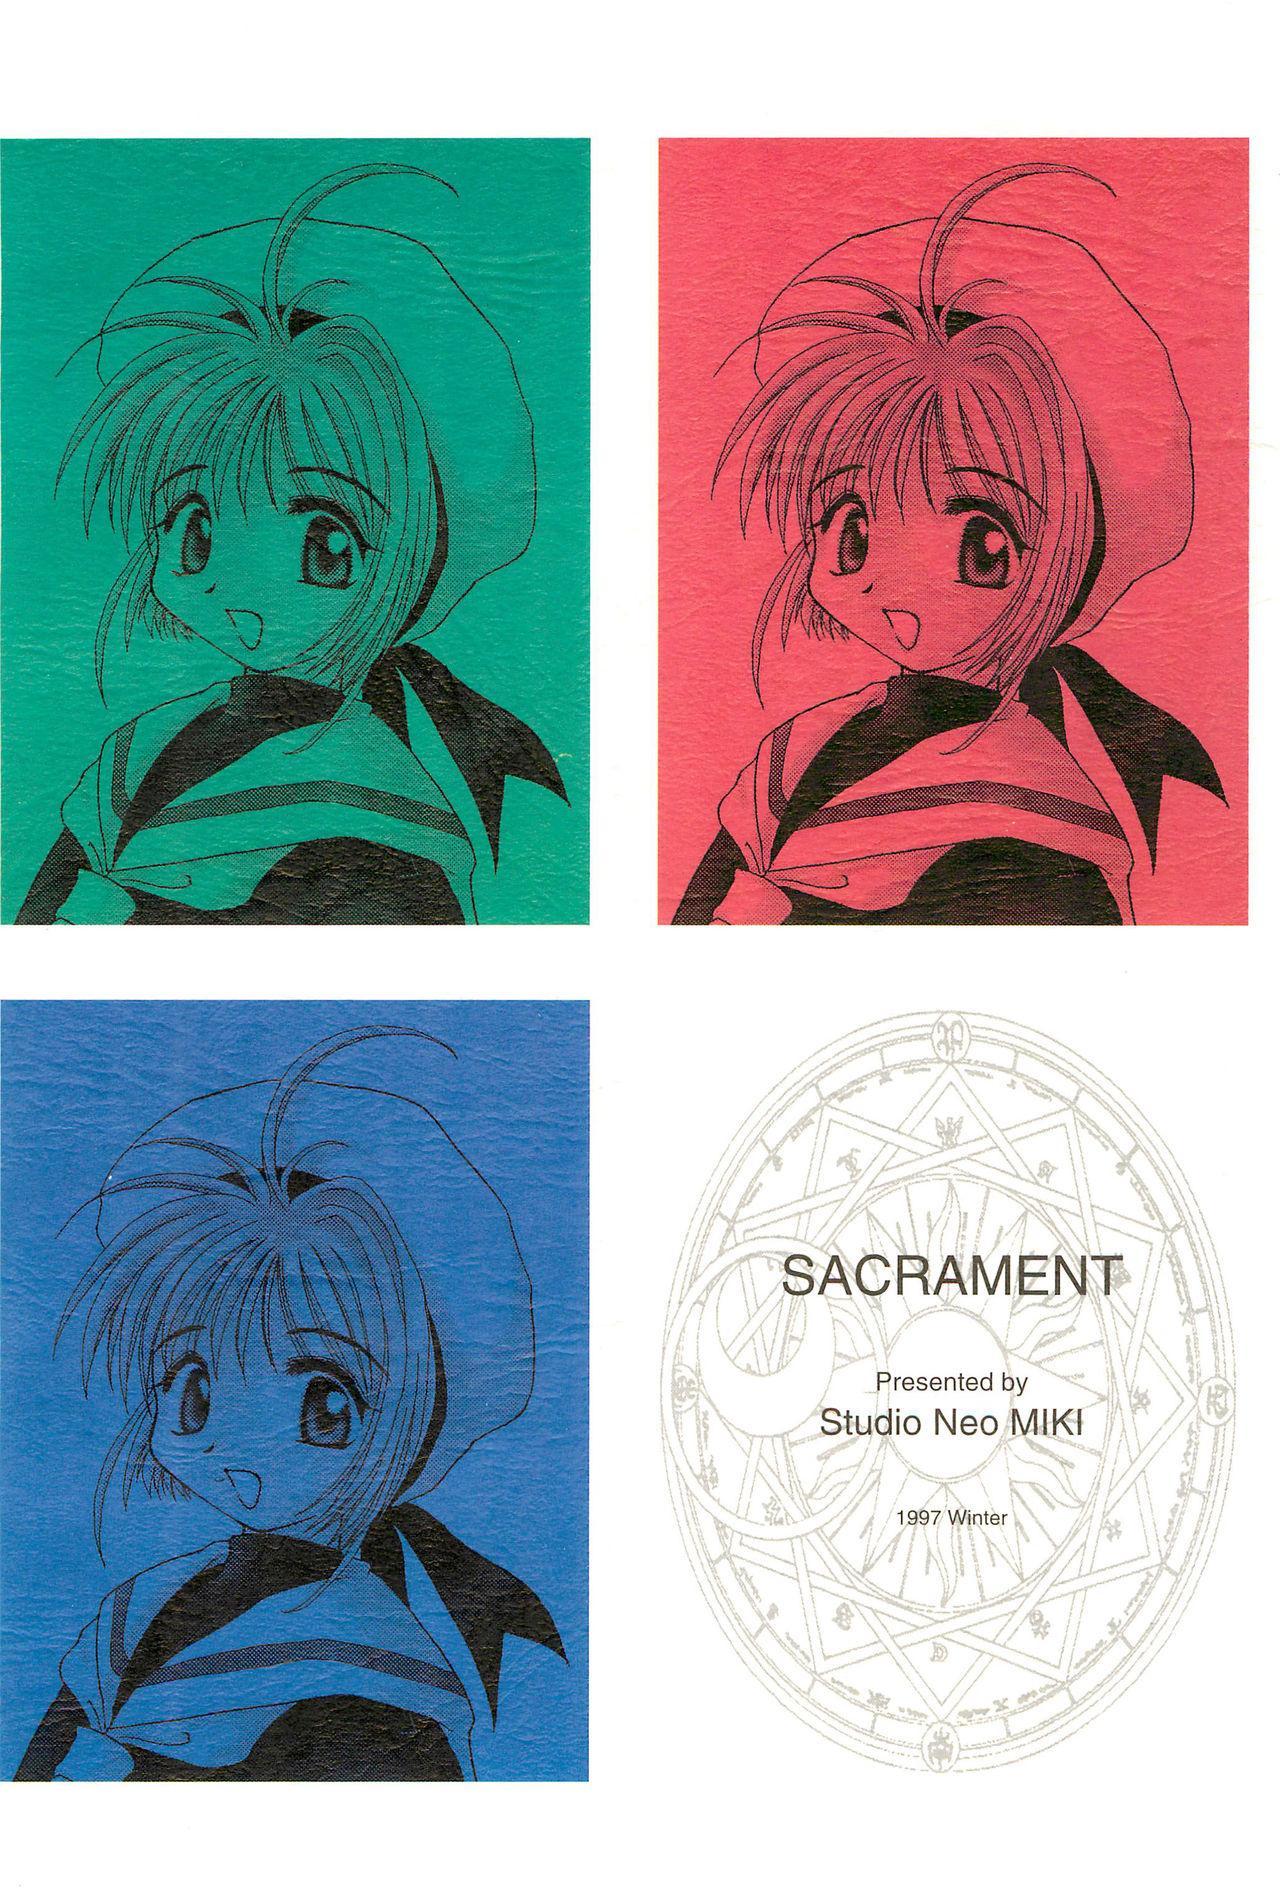 SACRAMENT 41